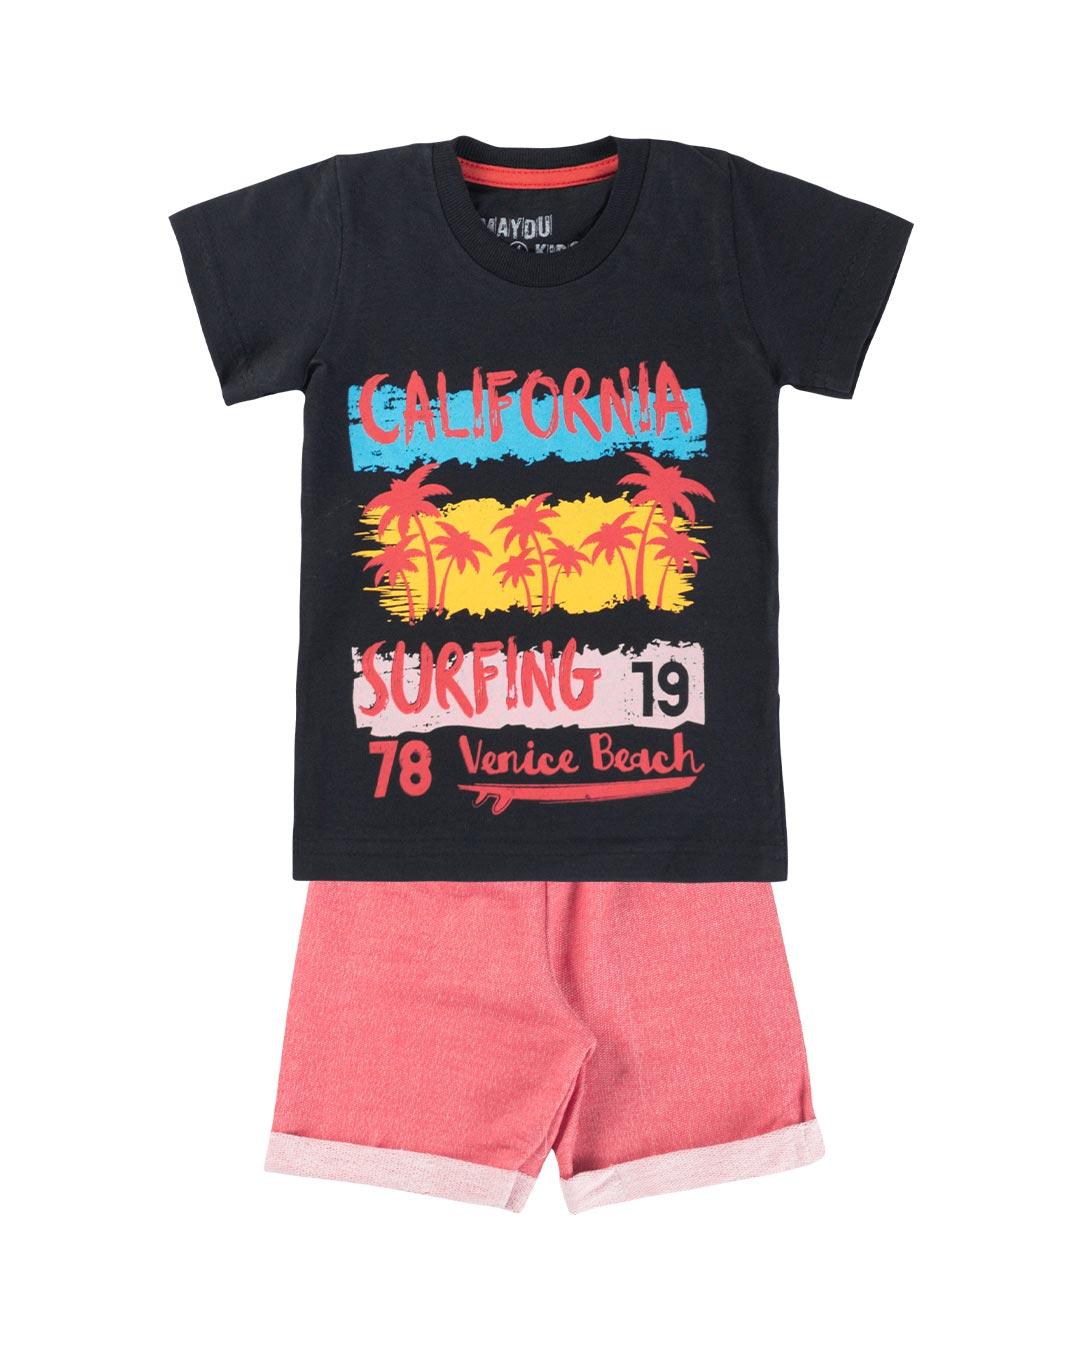 Conjunto Infantil Califórnia Surfing - Maydu kids